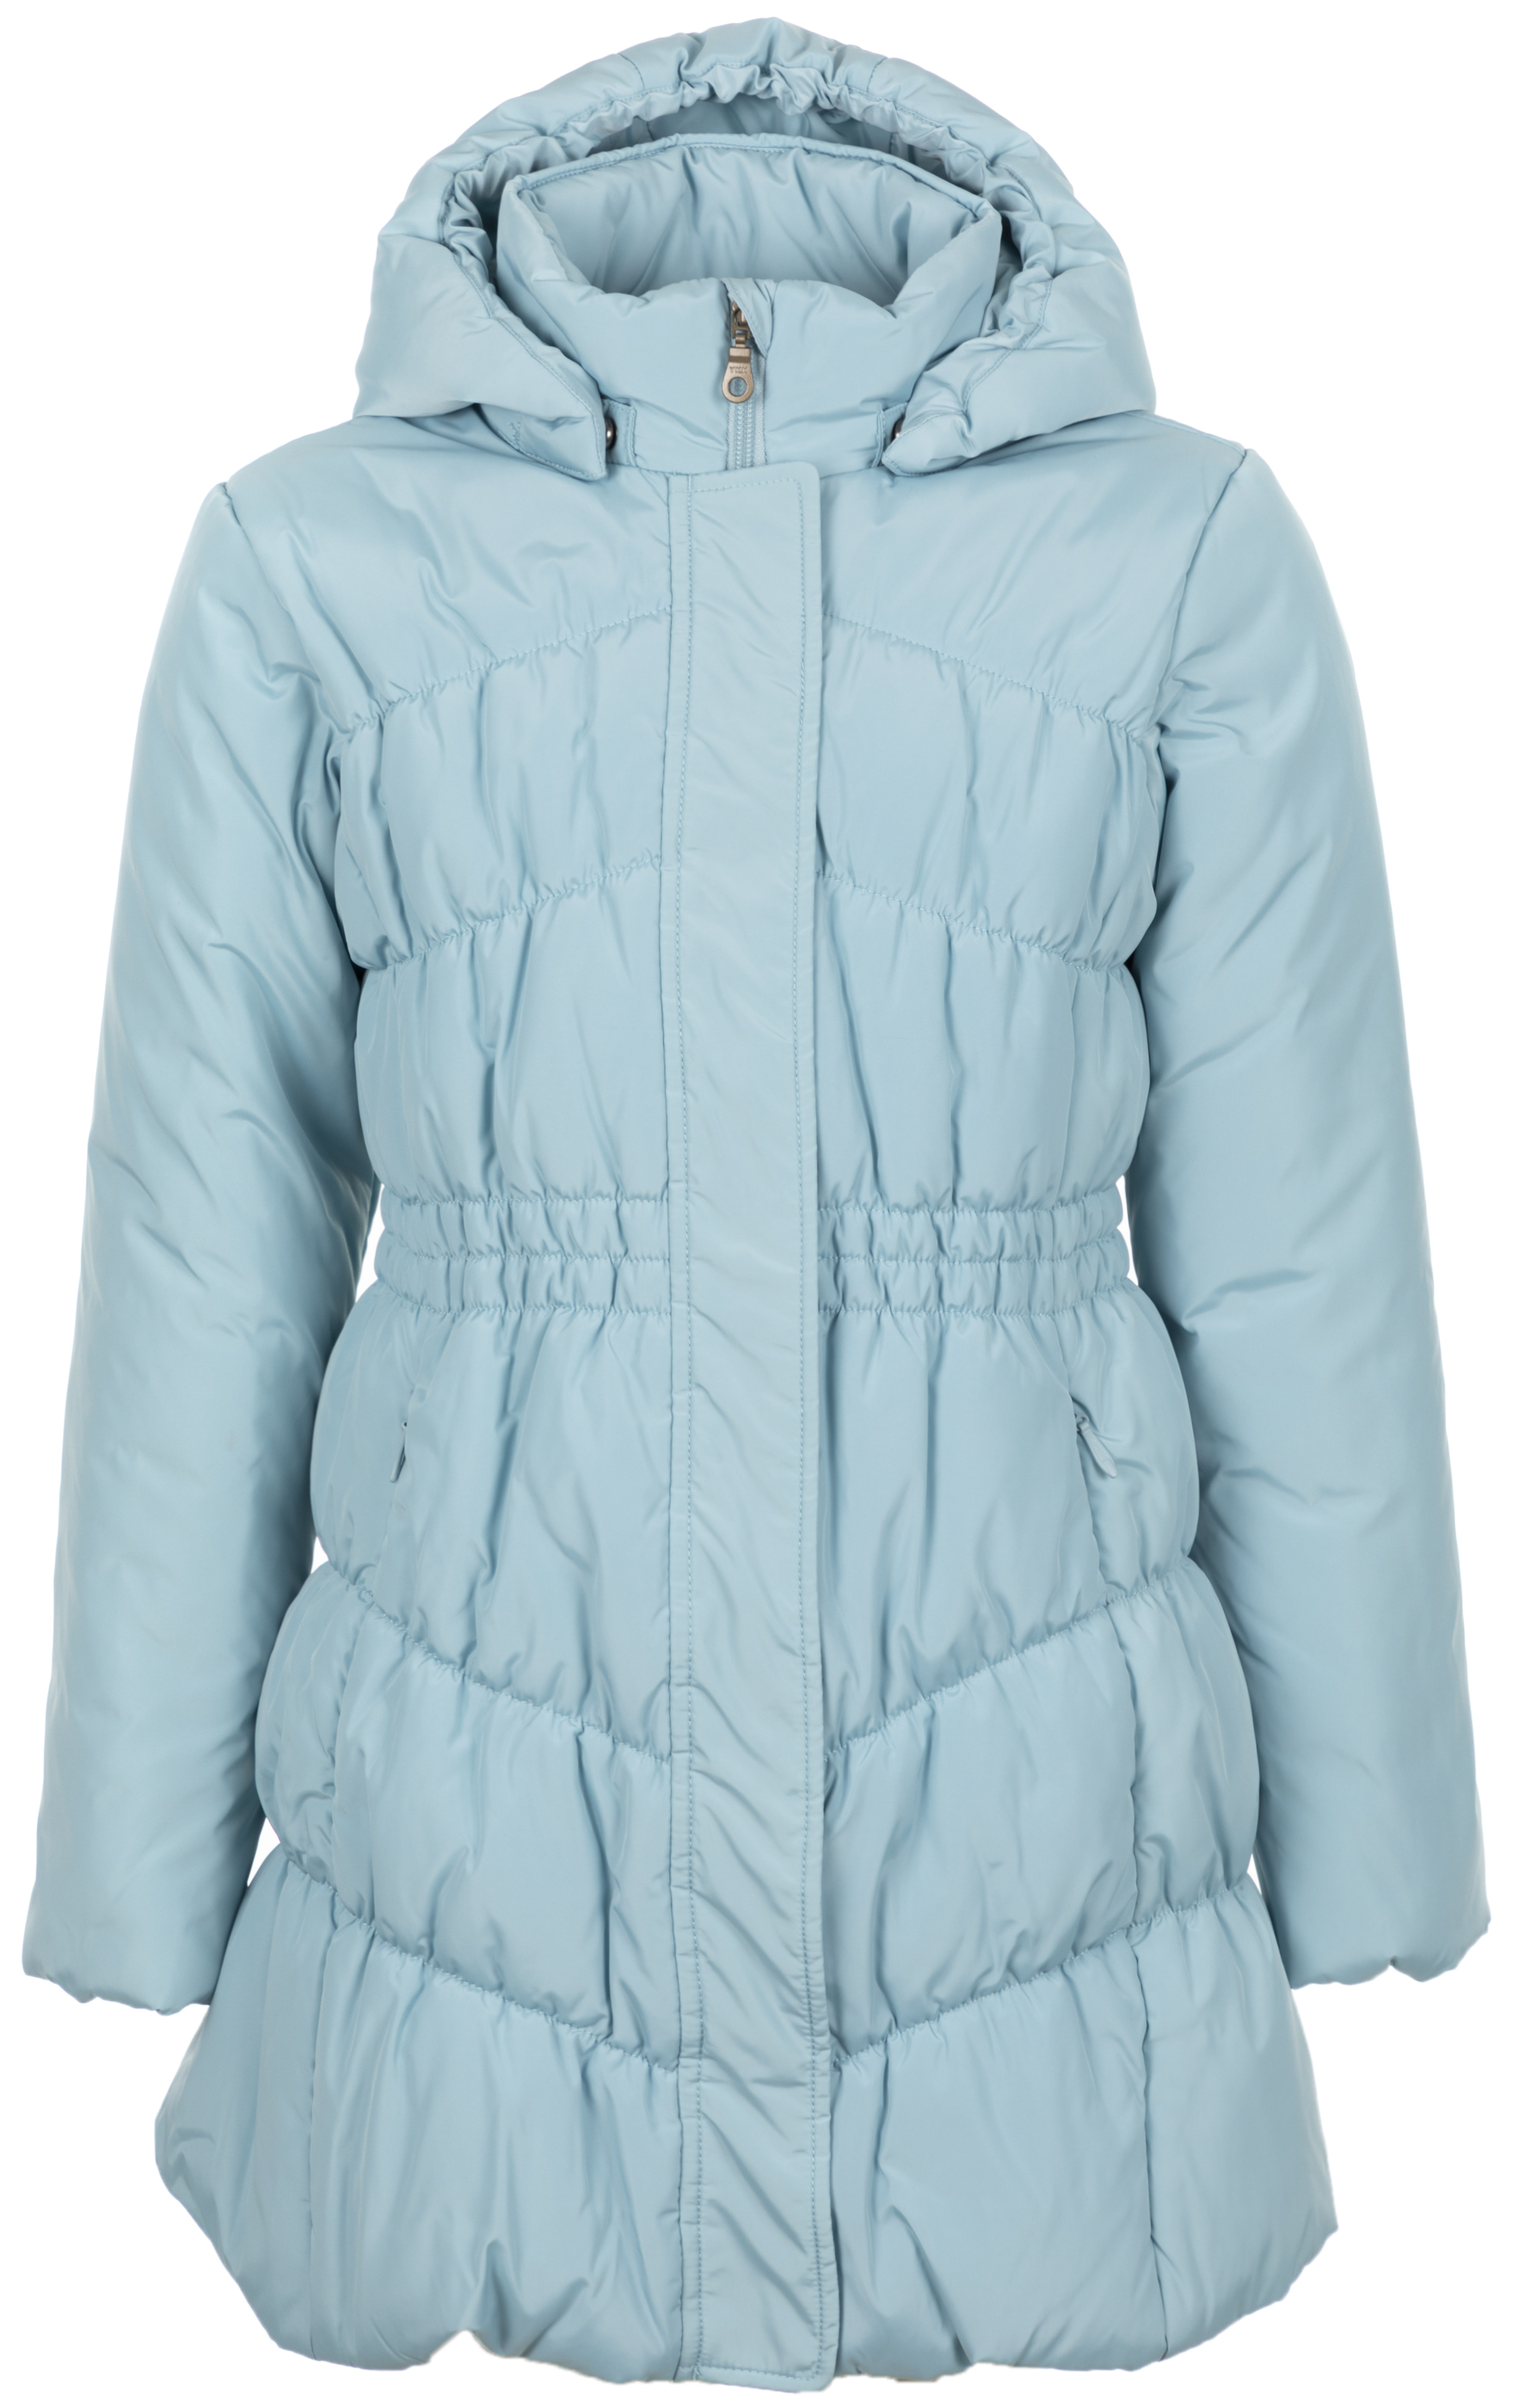 цена на Lassie Куртка утепленная для девочек LASSIE Rani, размер 122